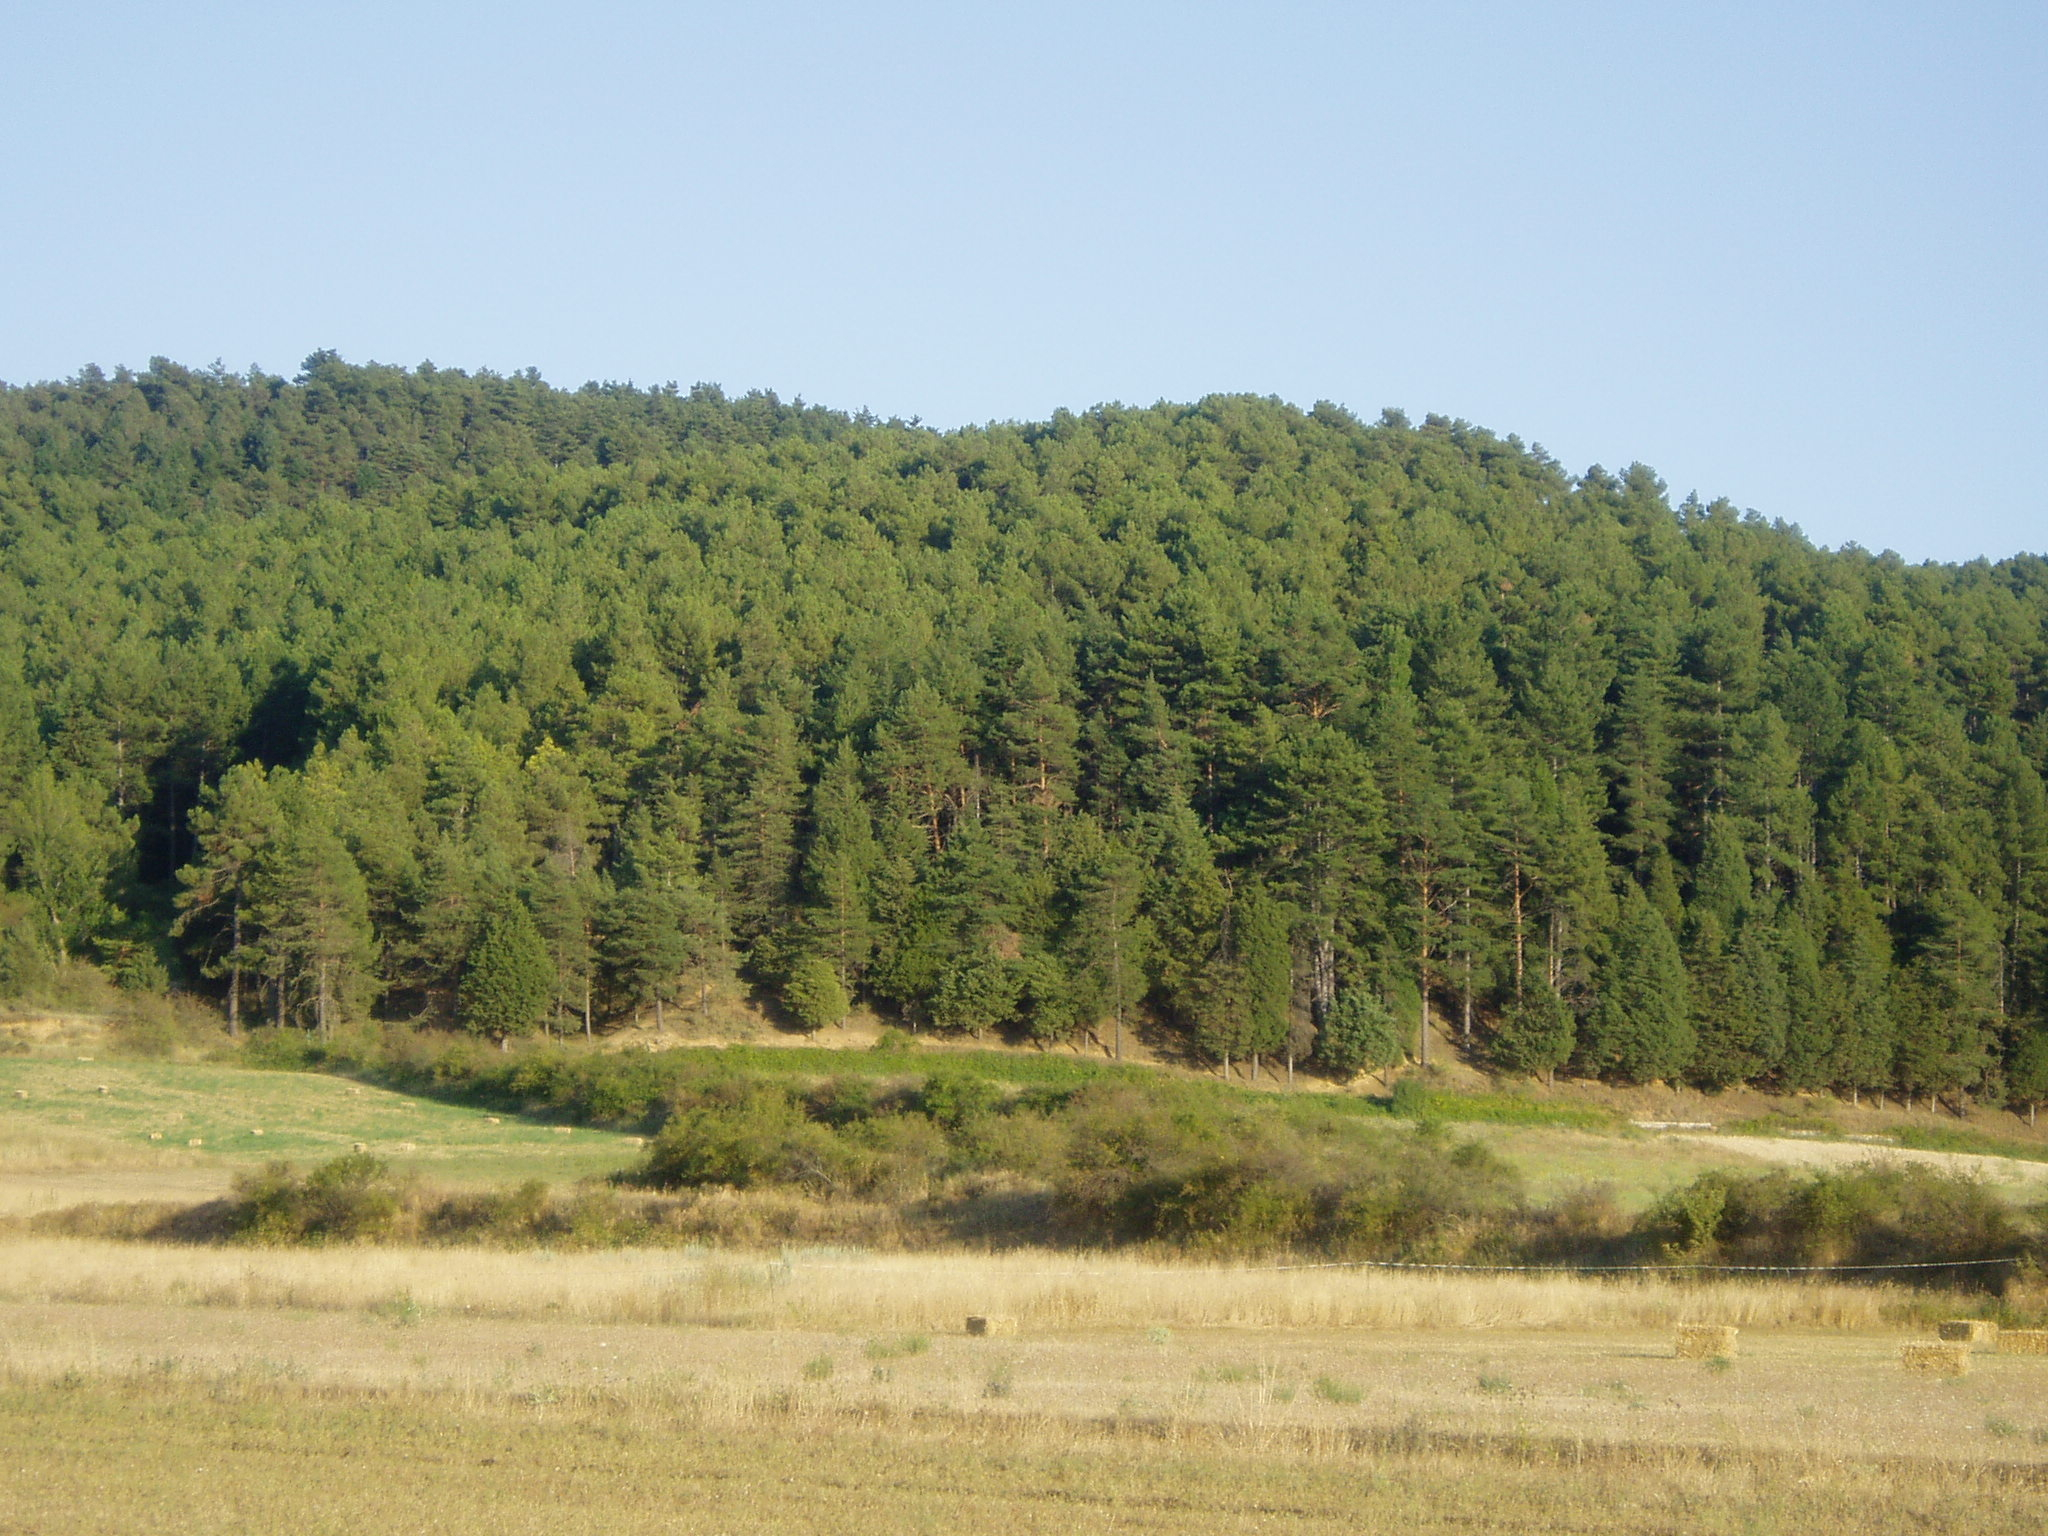 Bosque de pinos.